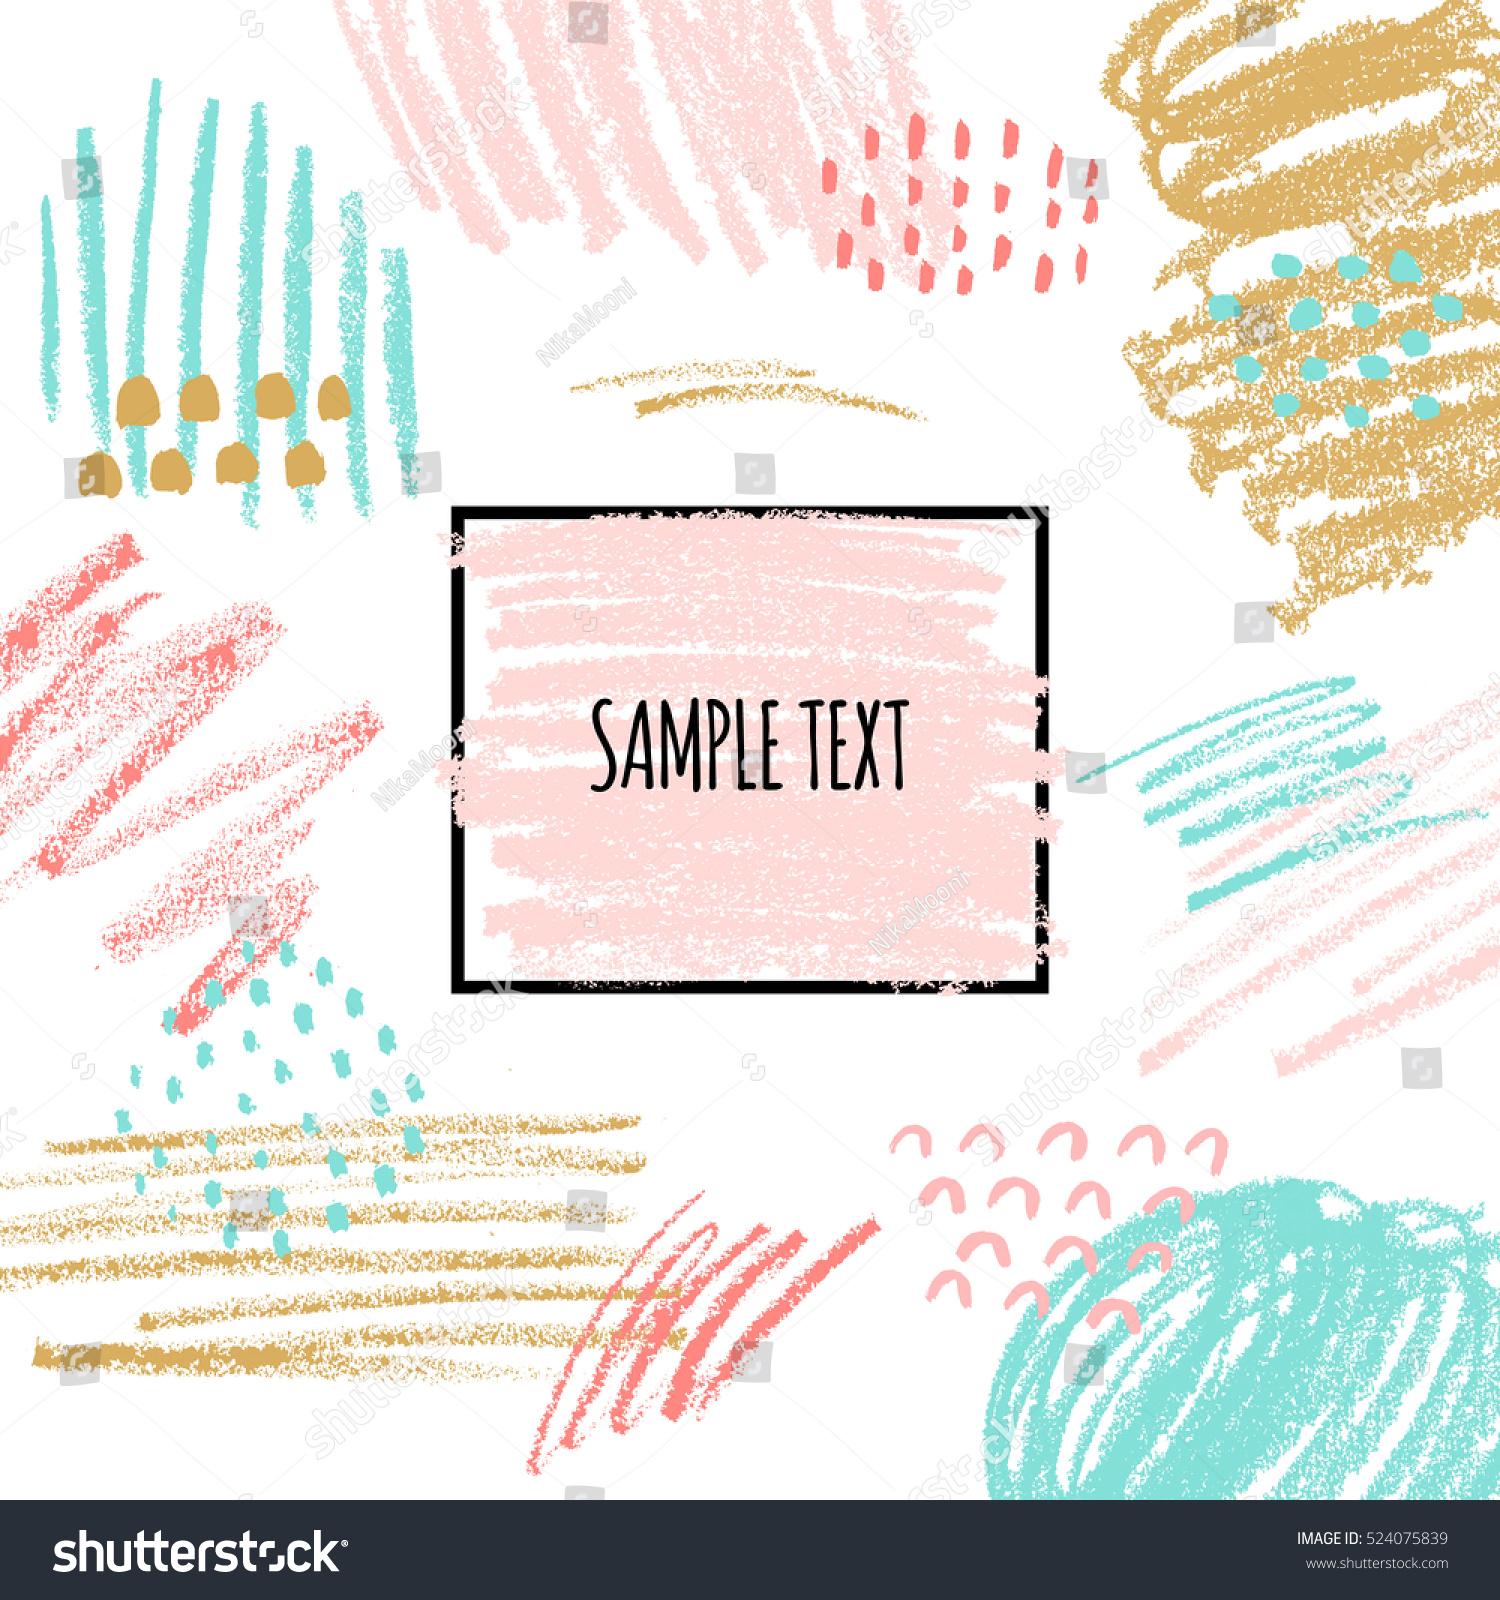 Artistic Background Hand Drawn Textures Pastel Vector de stock ...